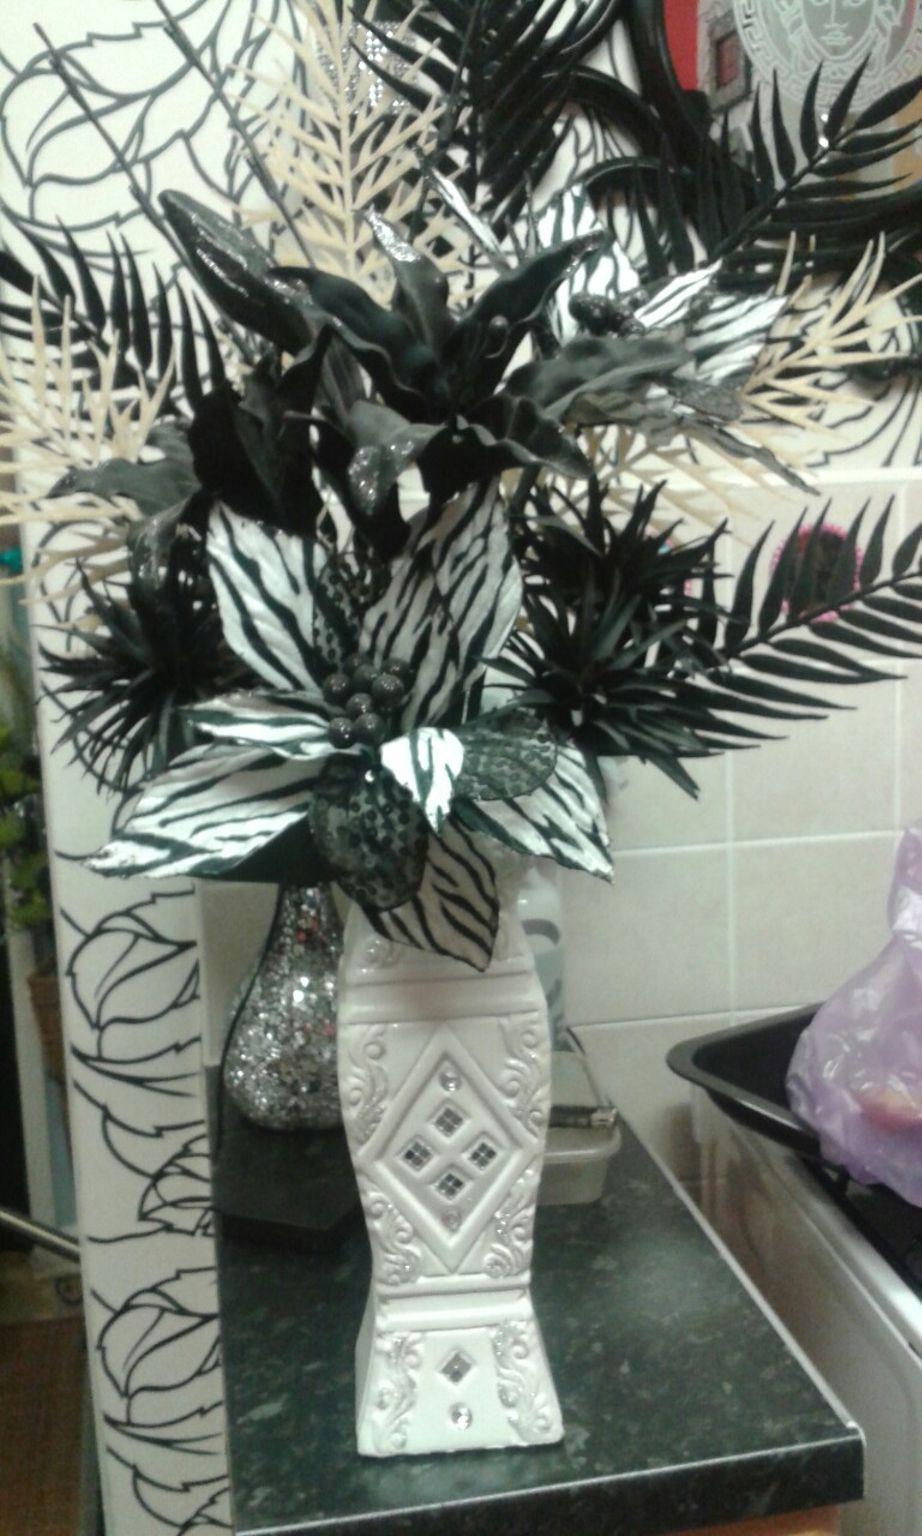 treasure craft vase of https en shpock com i wsp8sebccdzdaok1 2018 04 04t001557 inside flowers in vase with lights 615de0a8